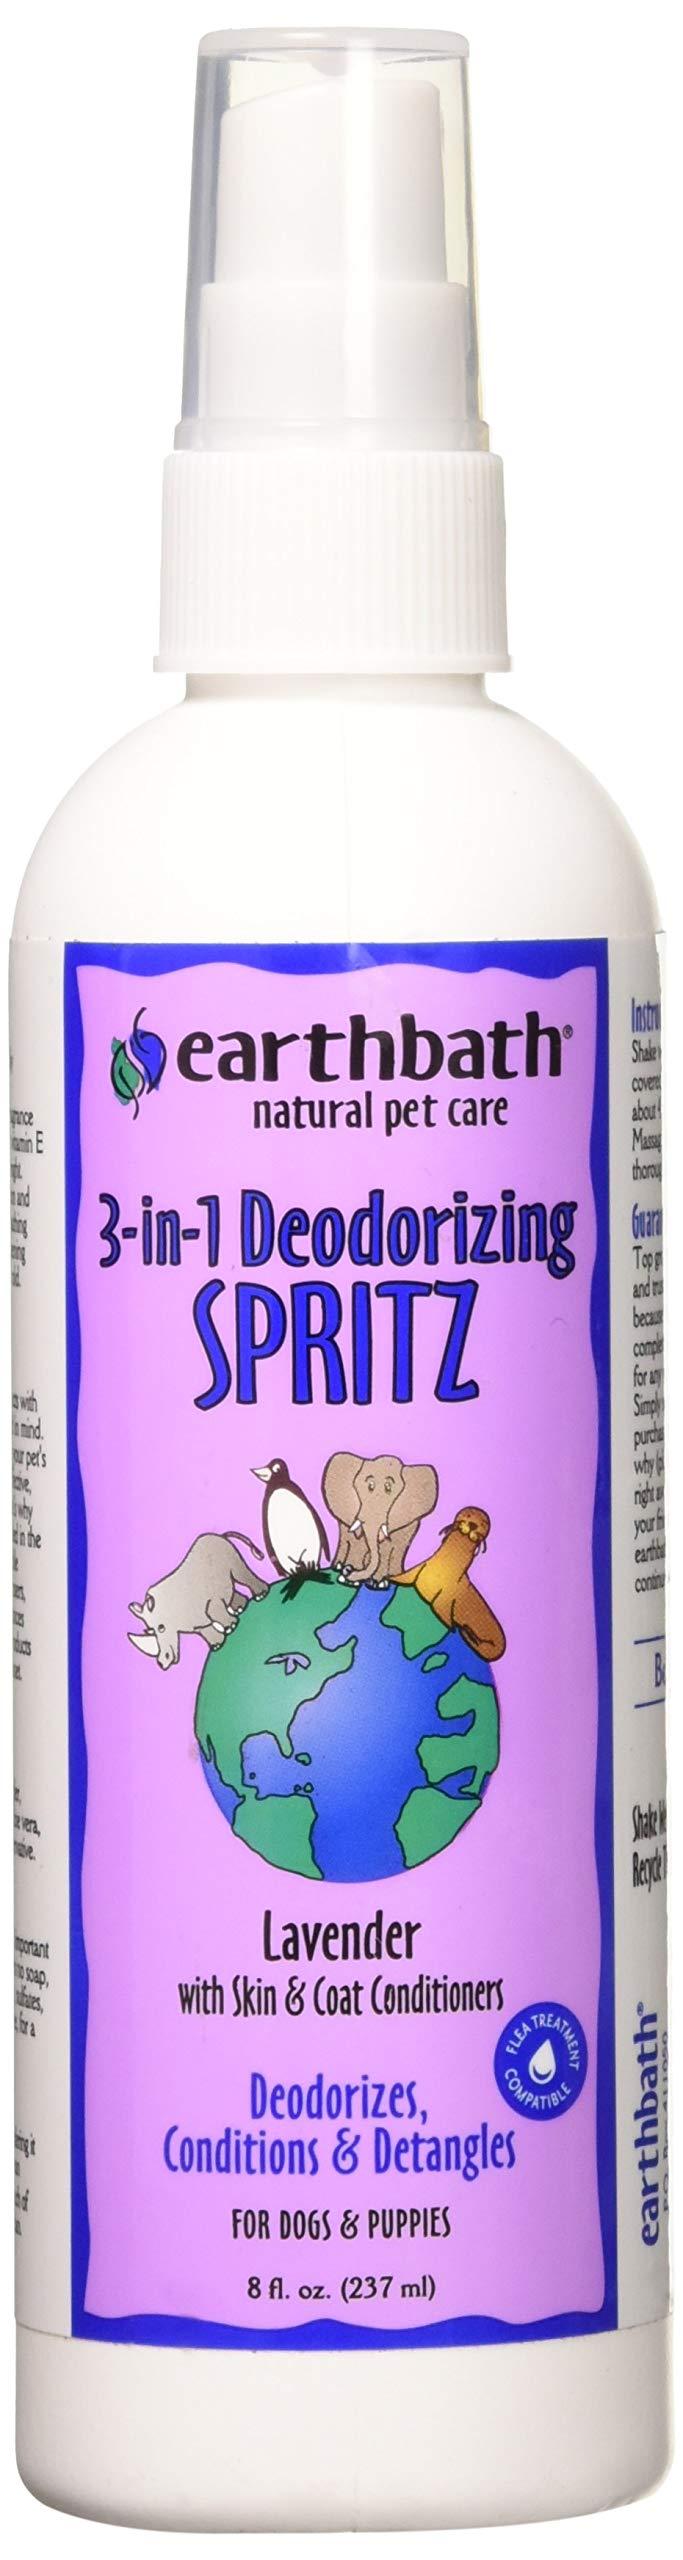 Earth Bath Lavender 3 - in - 1 Deodorizing Spritz for Dogs 8oz